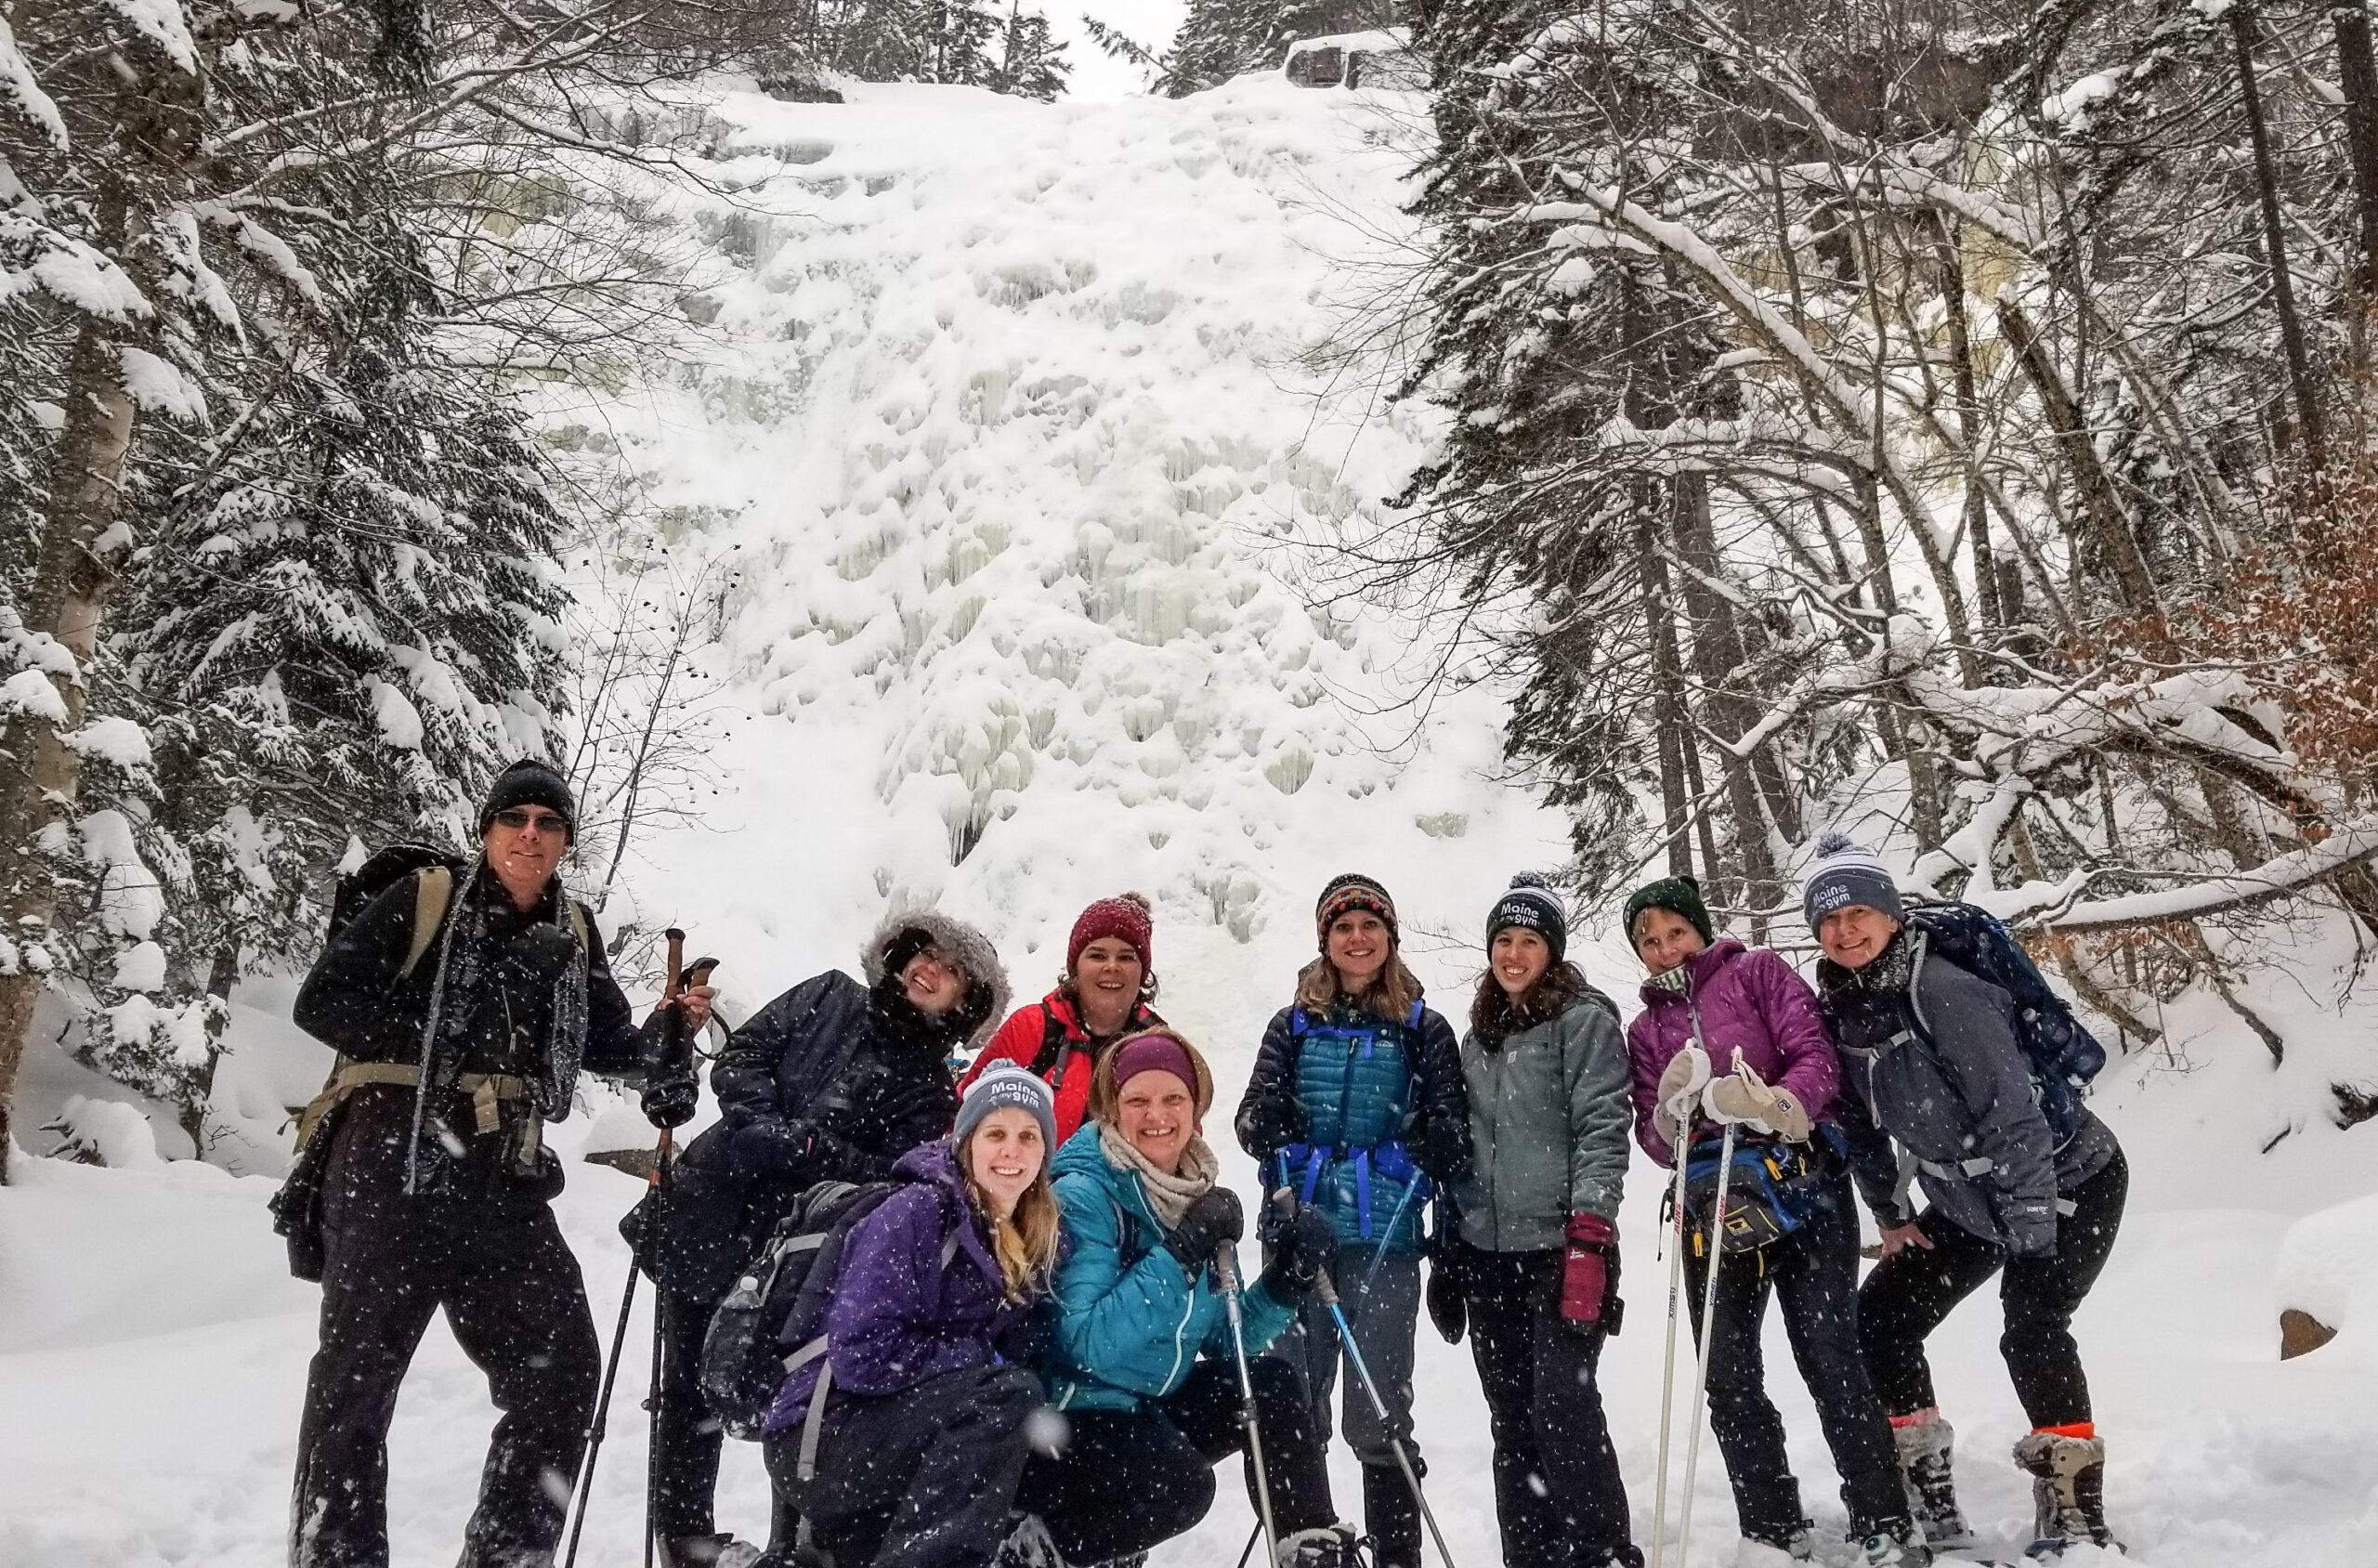 Snowshoe to Arethusa Falls, Crawford Notch, White Mountains